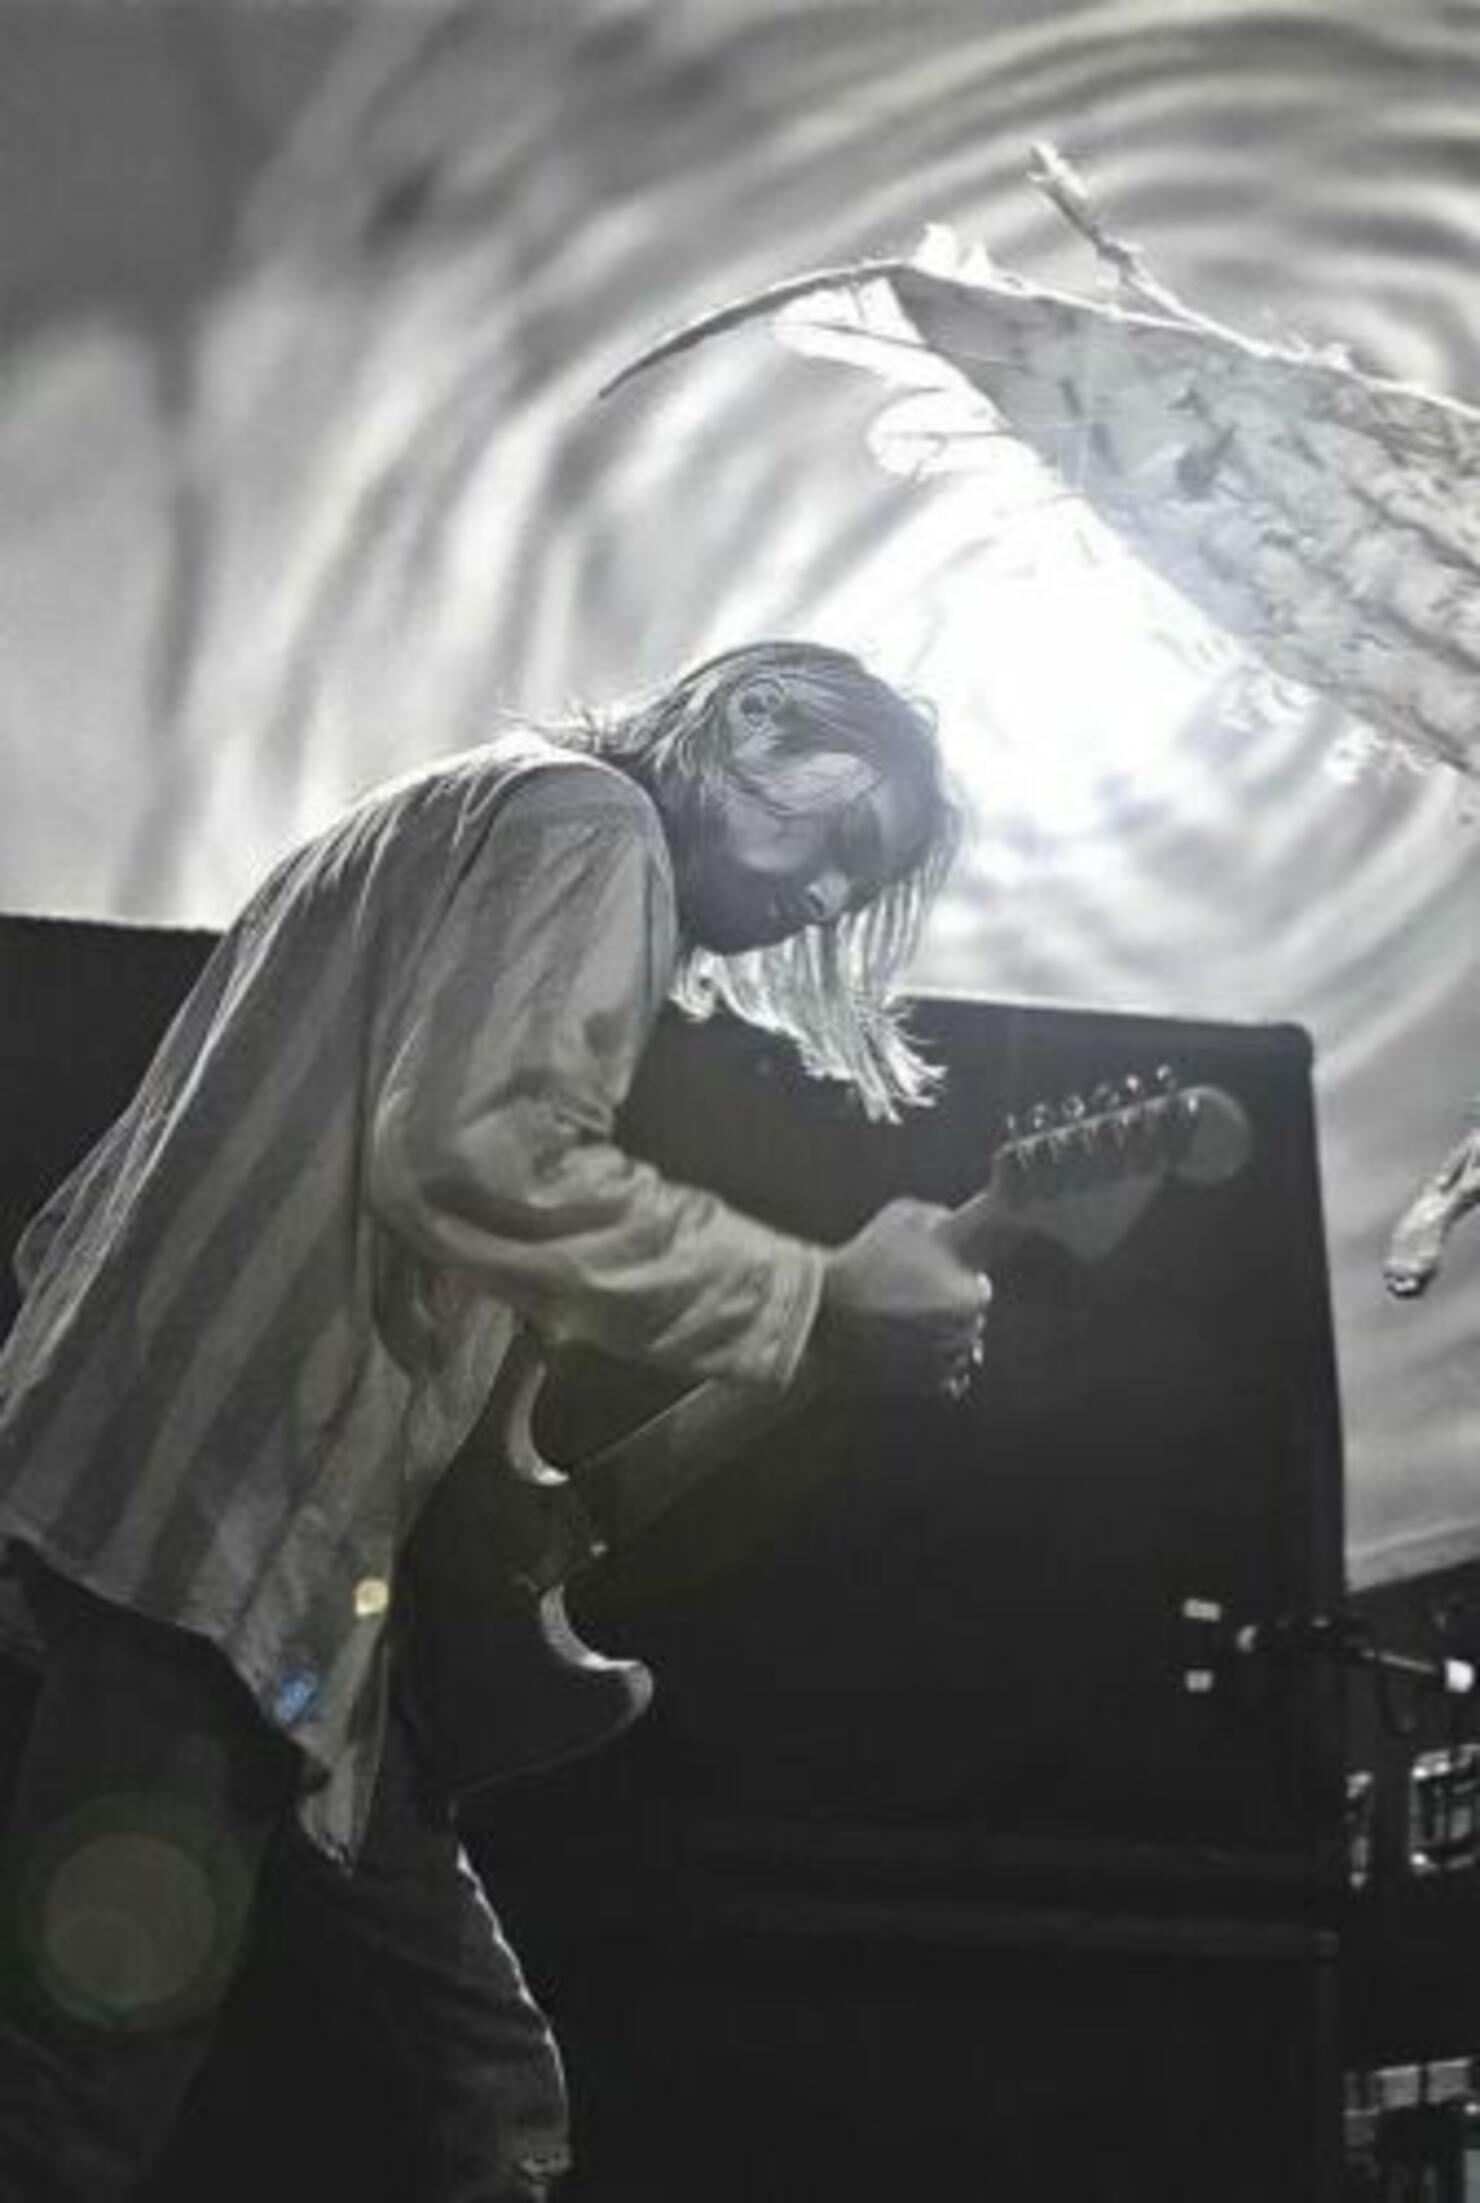 Nirvana-signed guitar